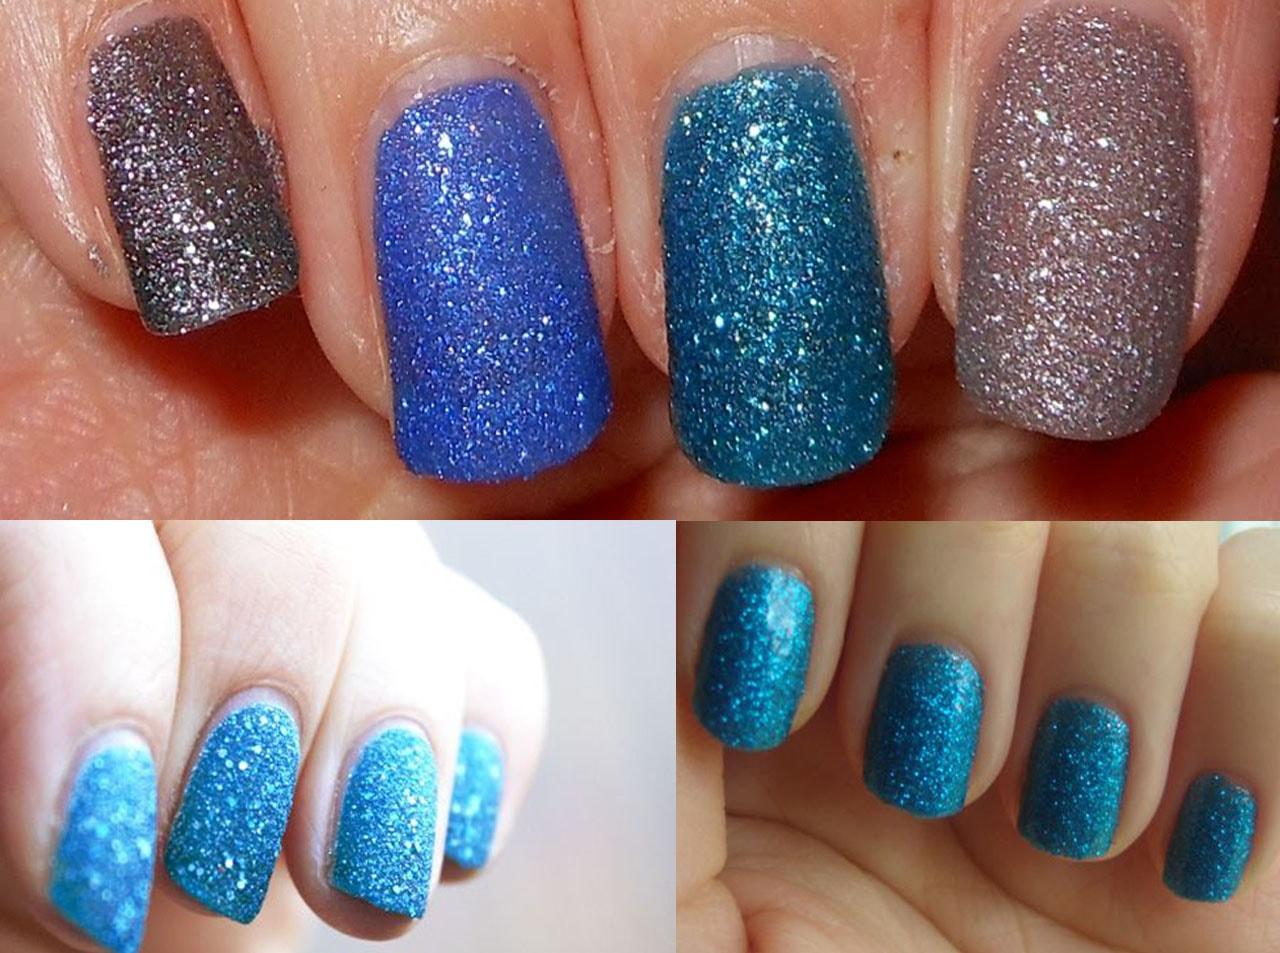 glitery-blue-mix-nail-art